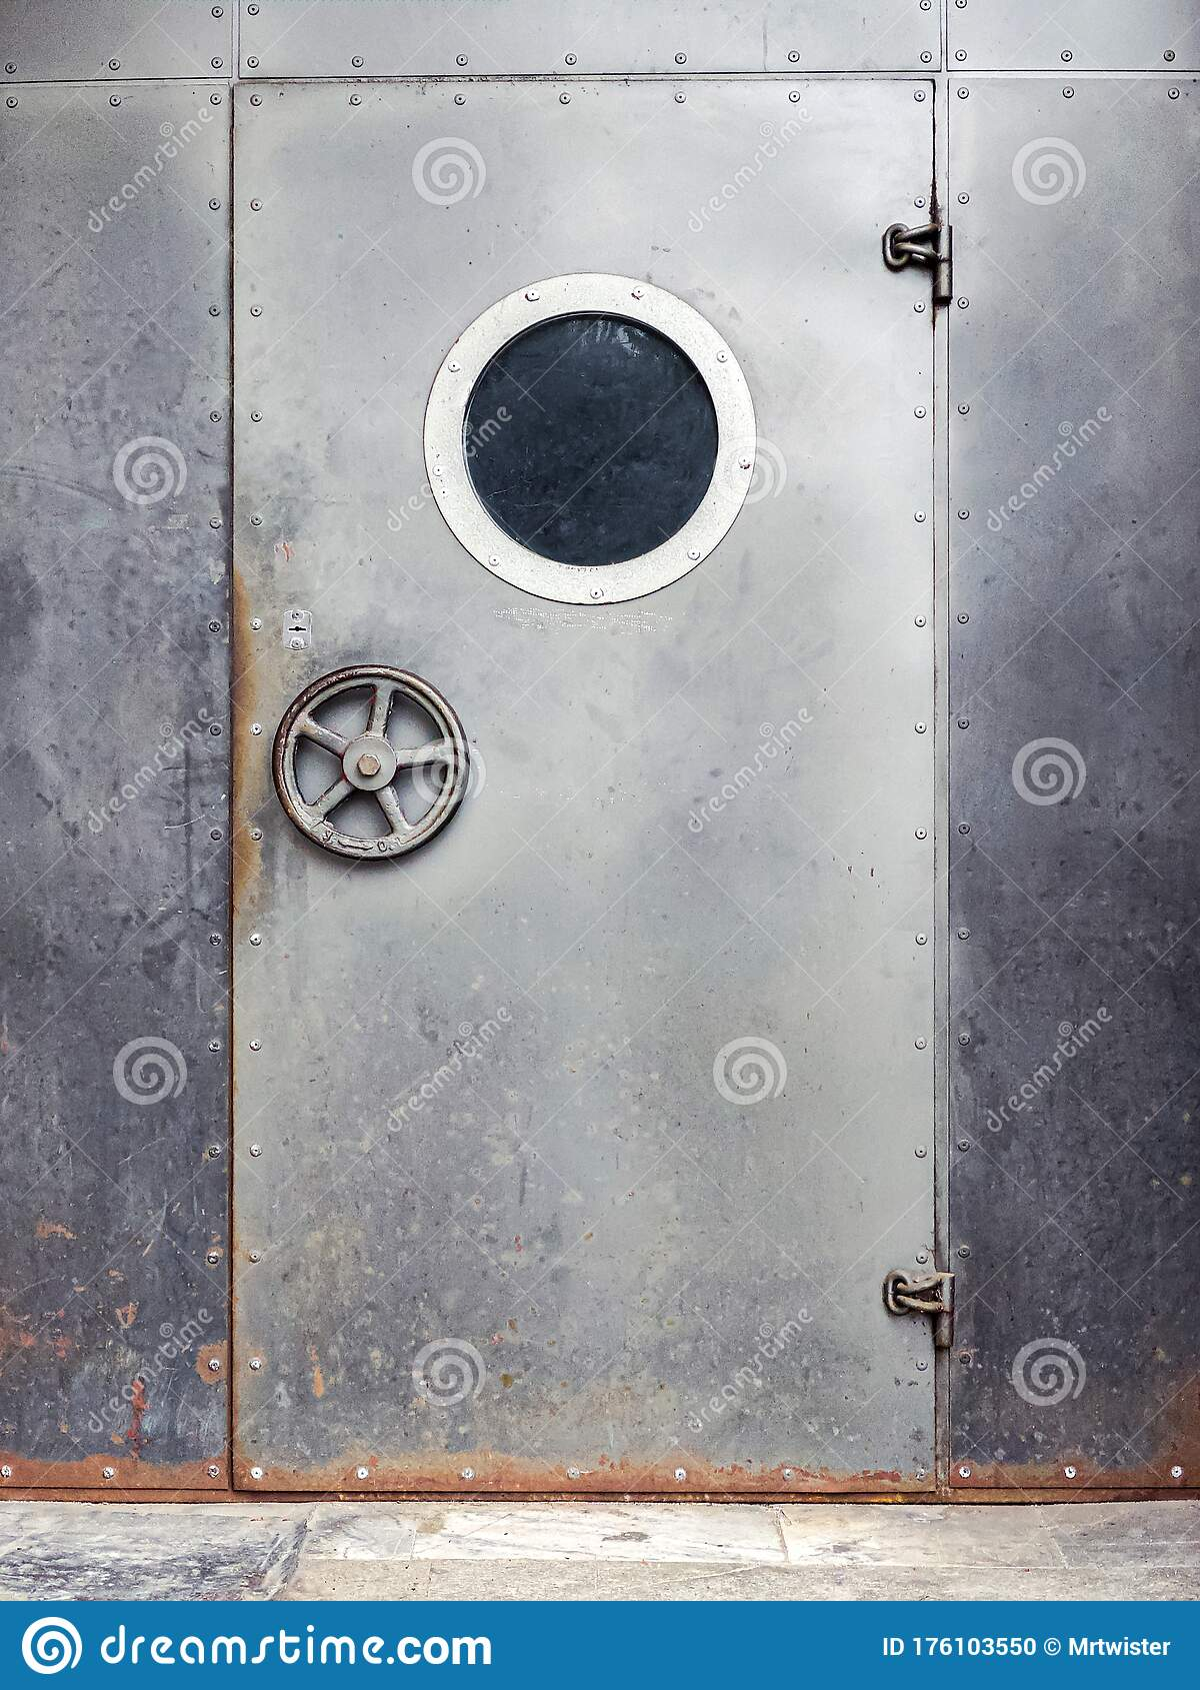 Metal Door Nautical Porthole Window Photos Free Royalty Free Stock Photos From Dreamstime Hd wallpaper metal door hatch round